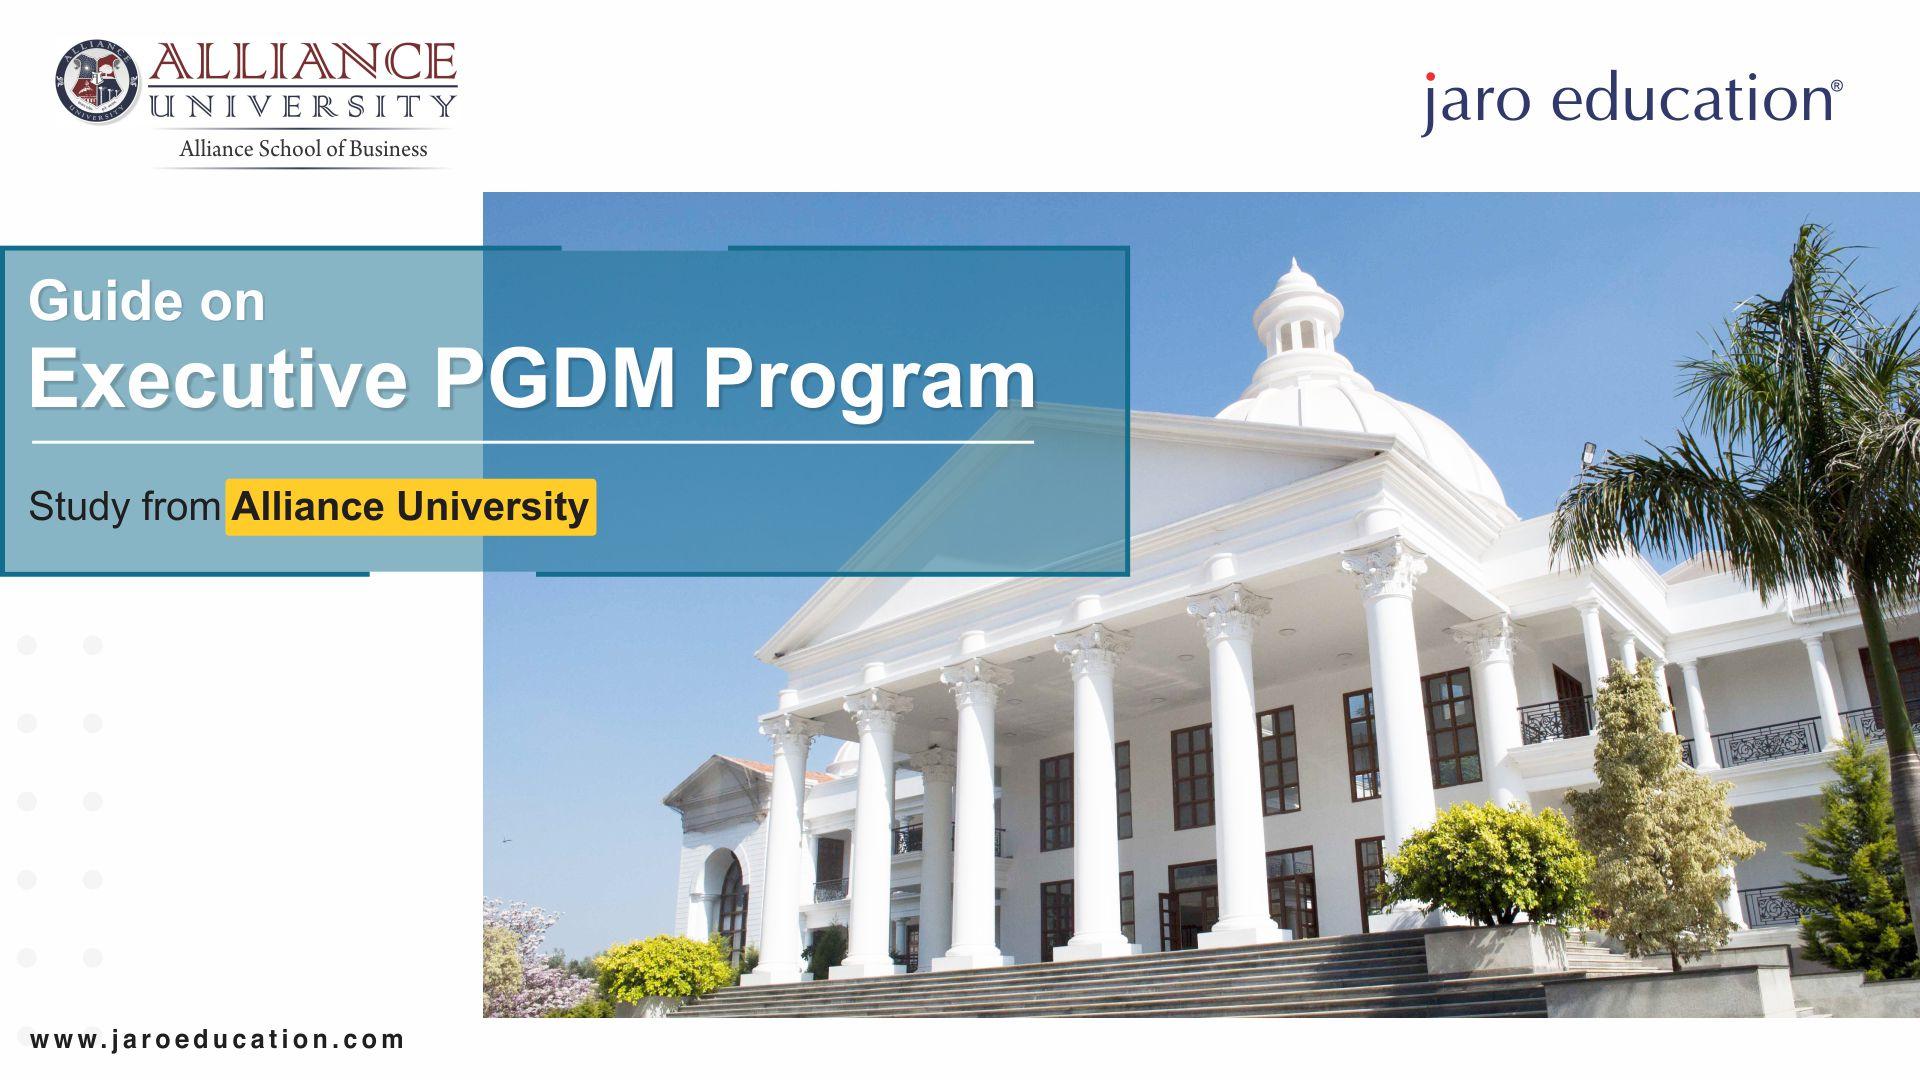 Guide on Executive PGDM program